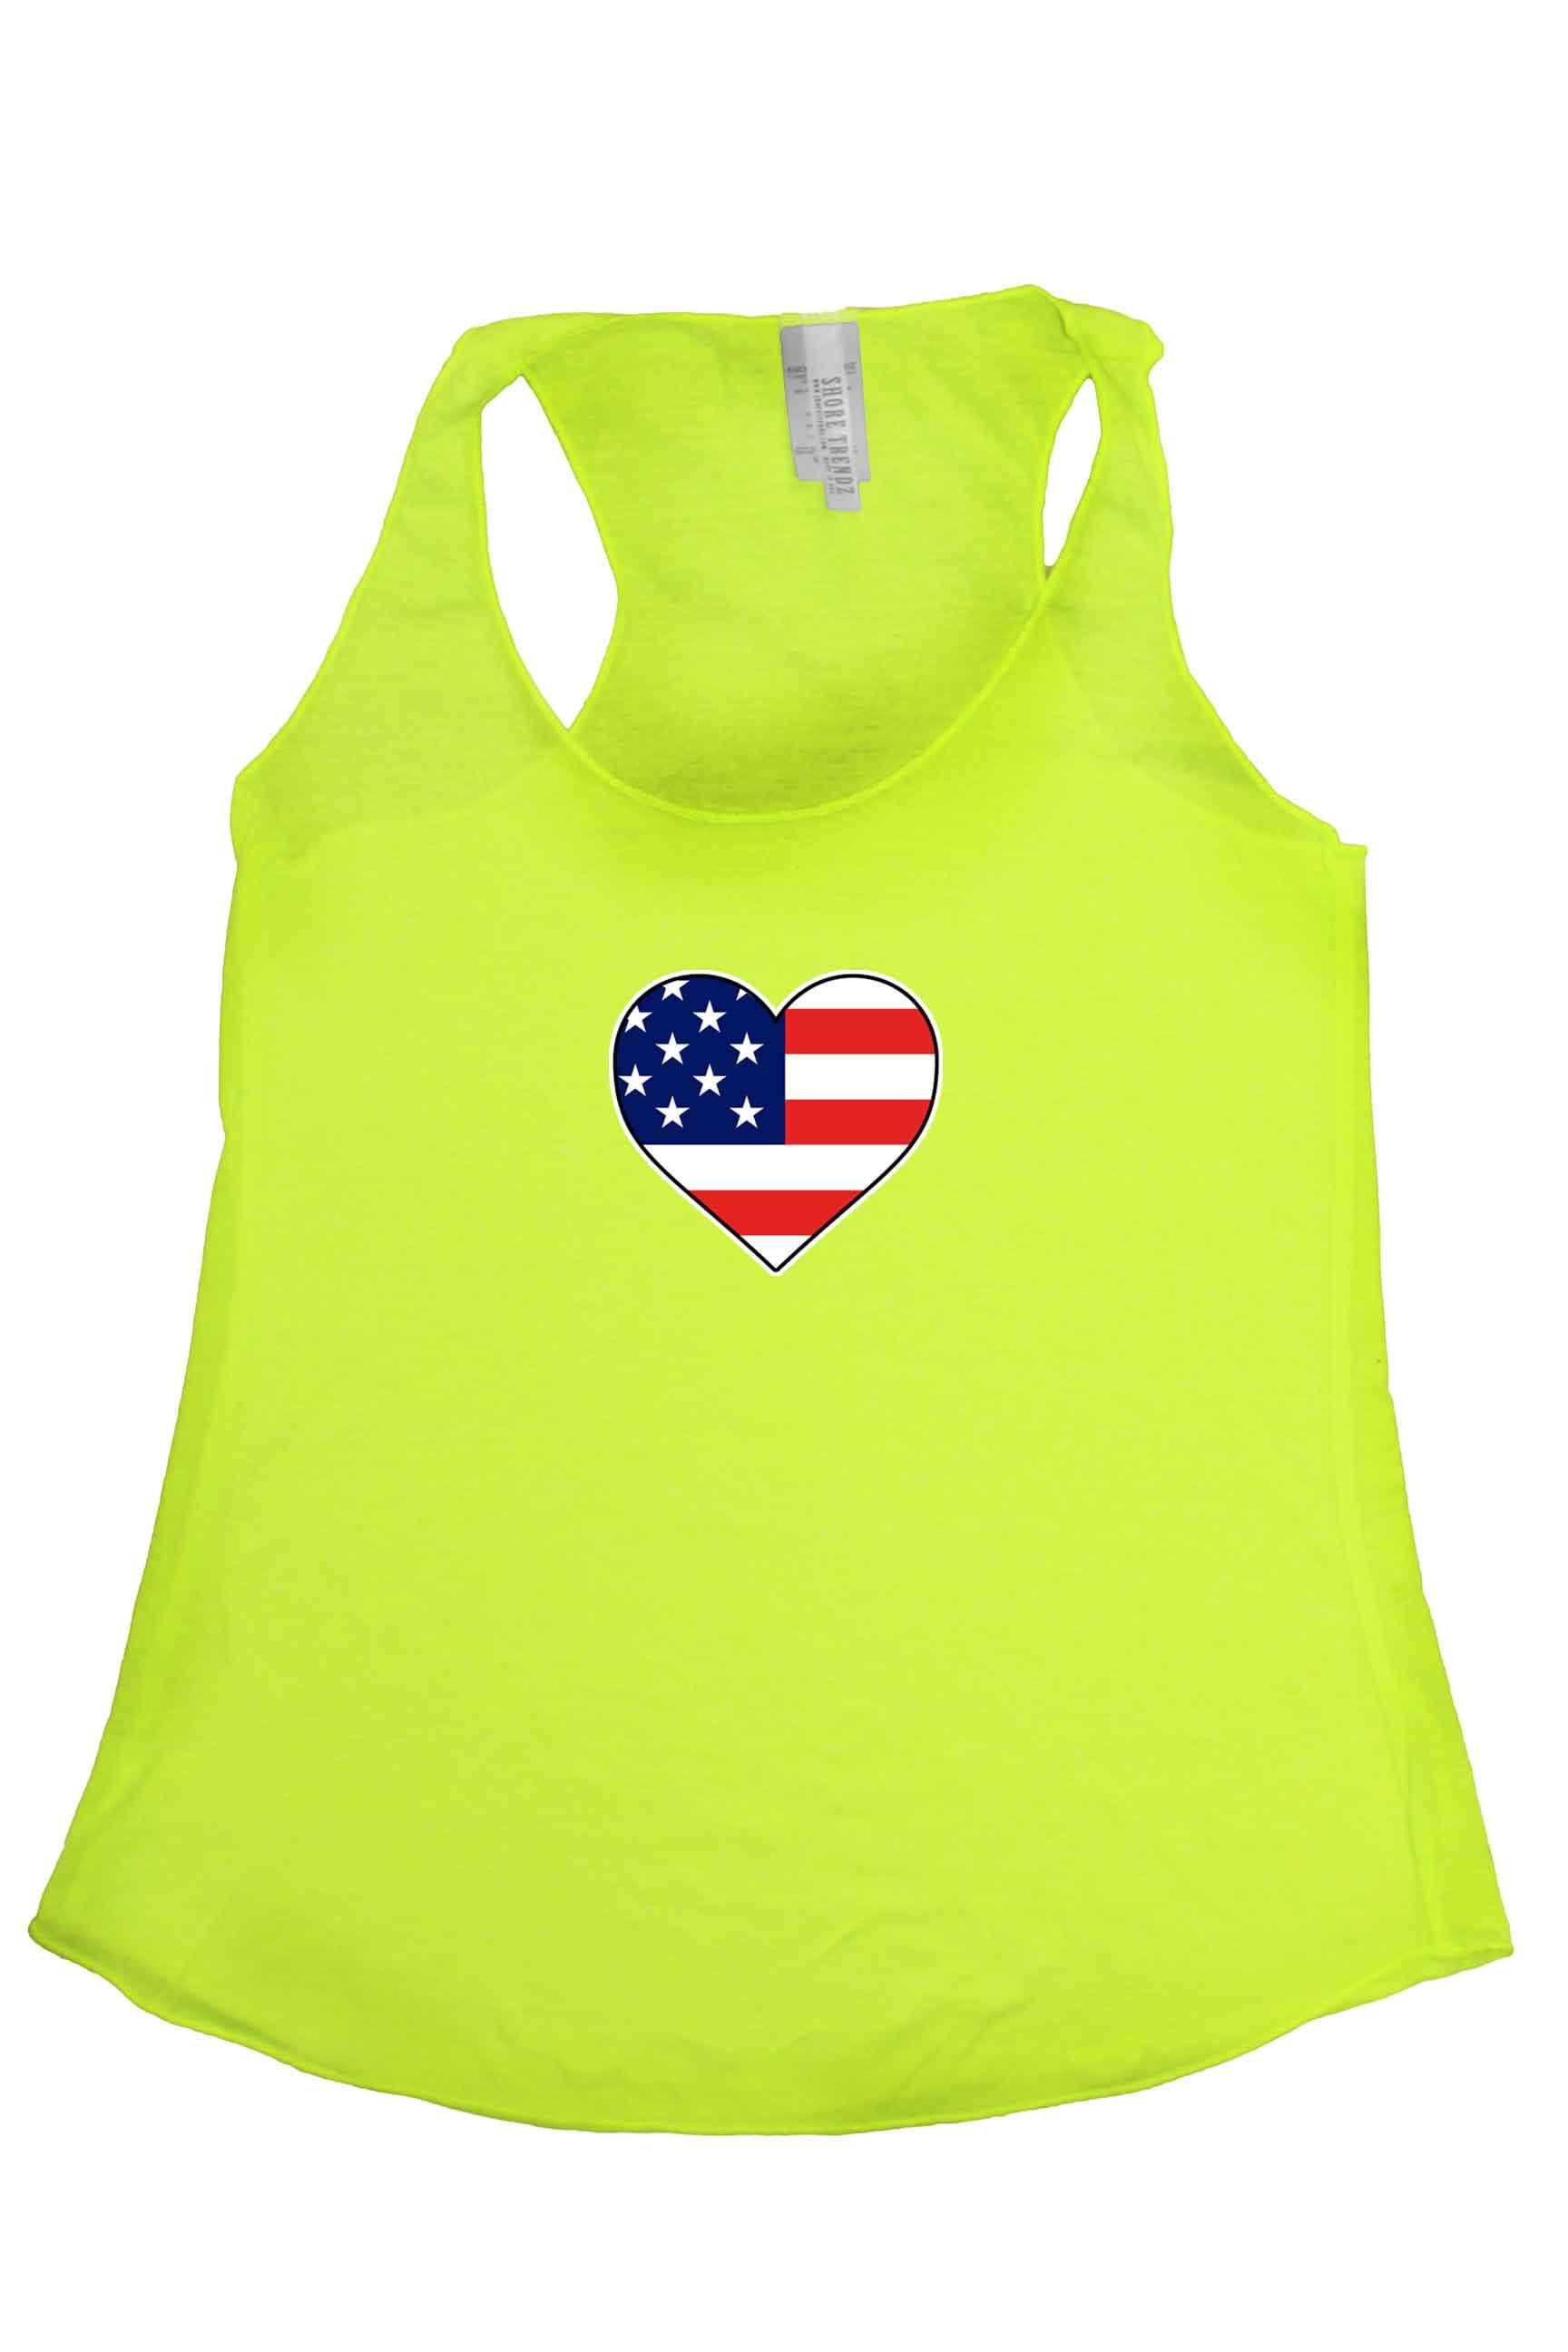 Women's USA Flag Tri-Blend Tank Top American Love Heart